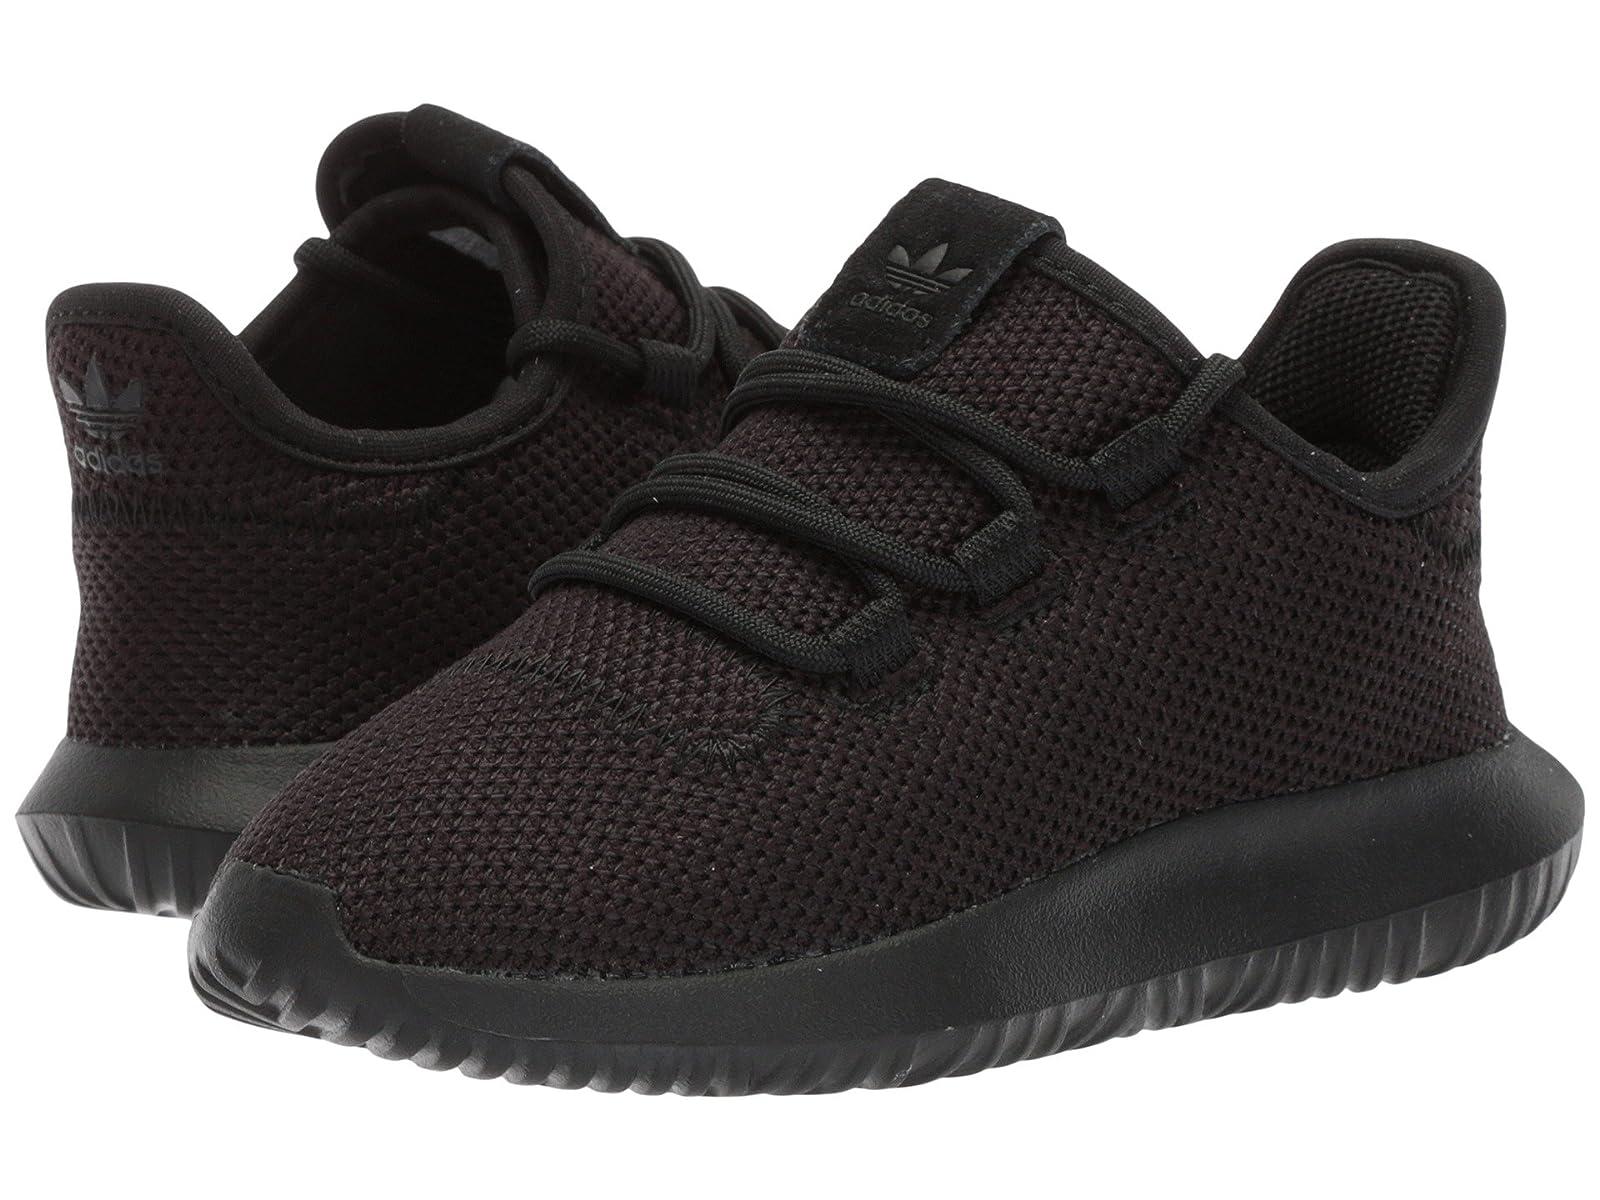 adidas Originals Kids Tubular Shadow (Little Kid)Atmospheric grades have affordable shoes